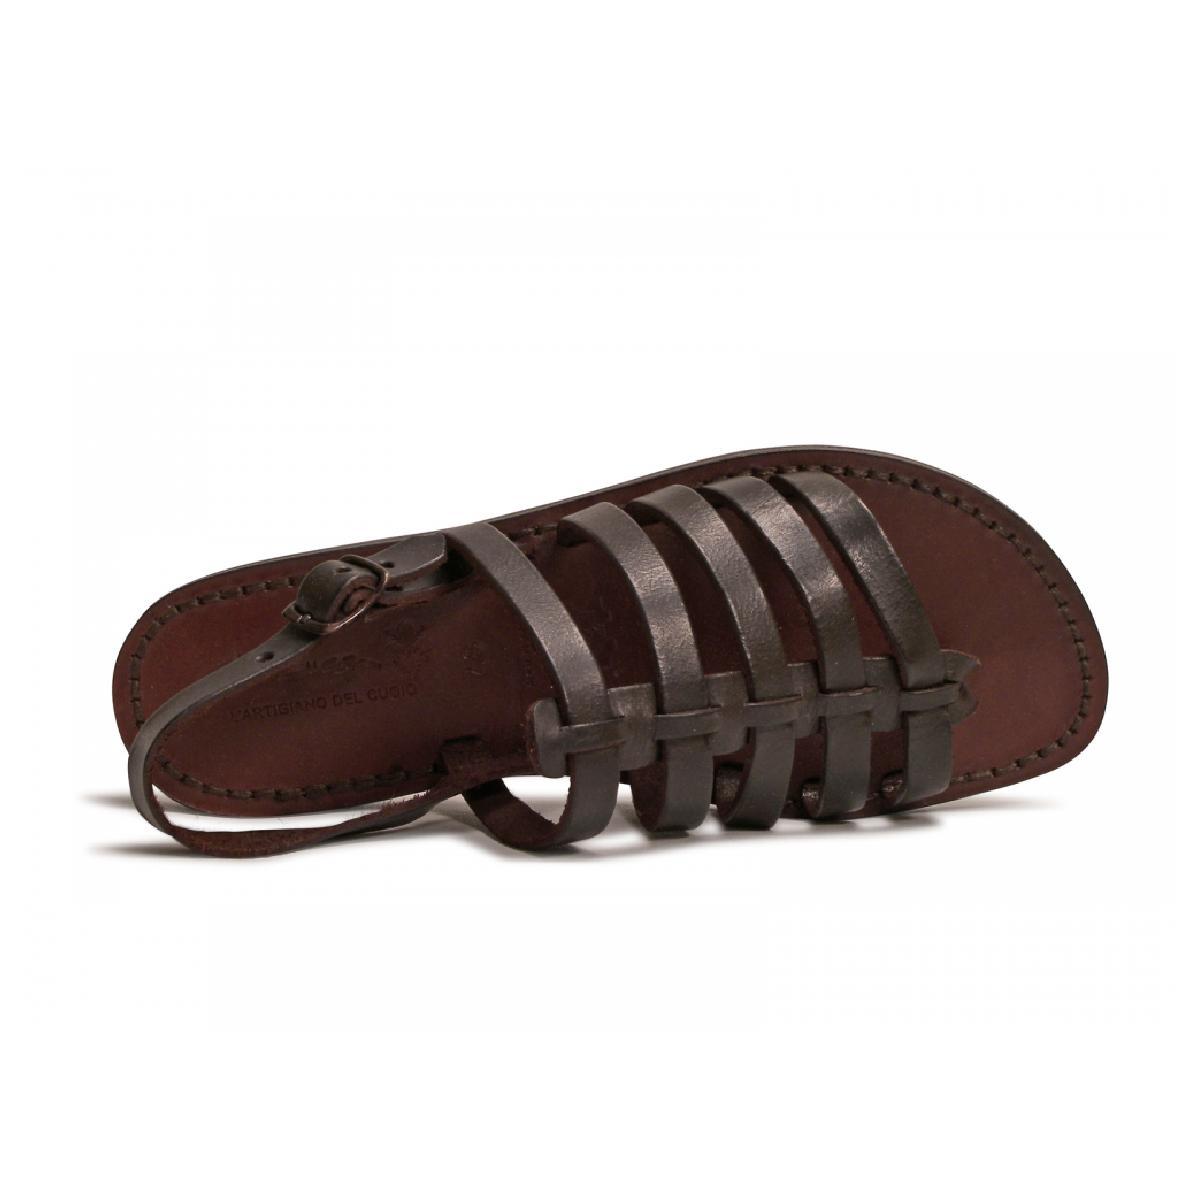 damen flip flop sandalen aus braunem leder in italien von. Black Bedroom Furniture Sets. Home Design Ideas